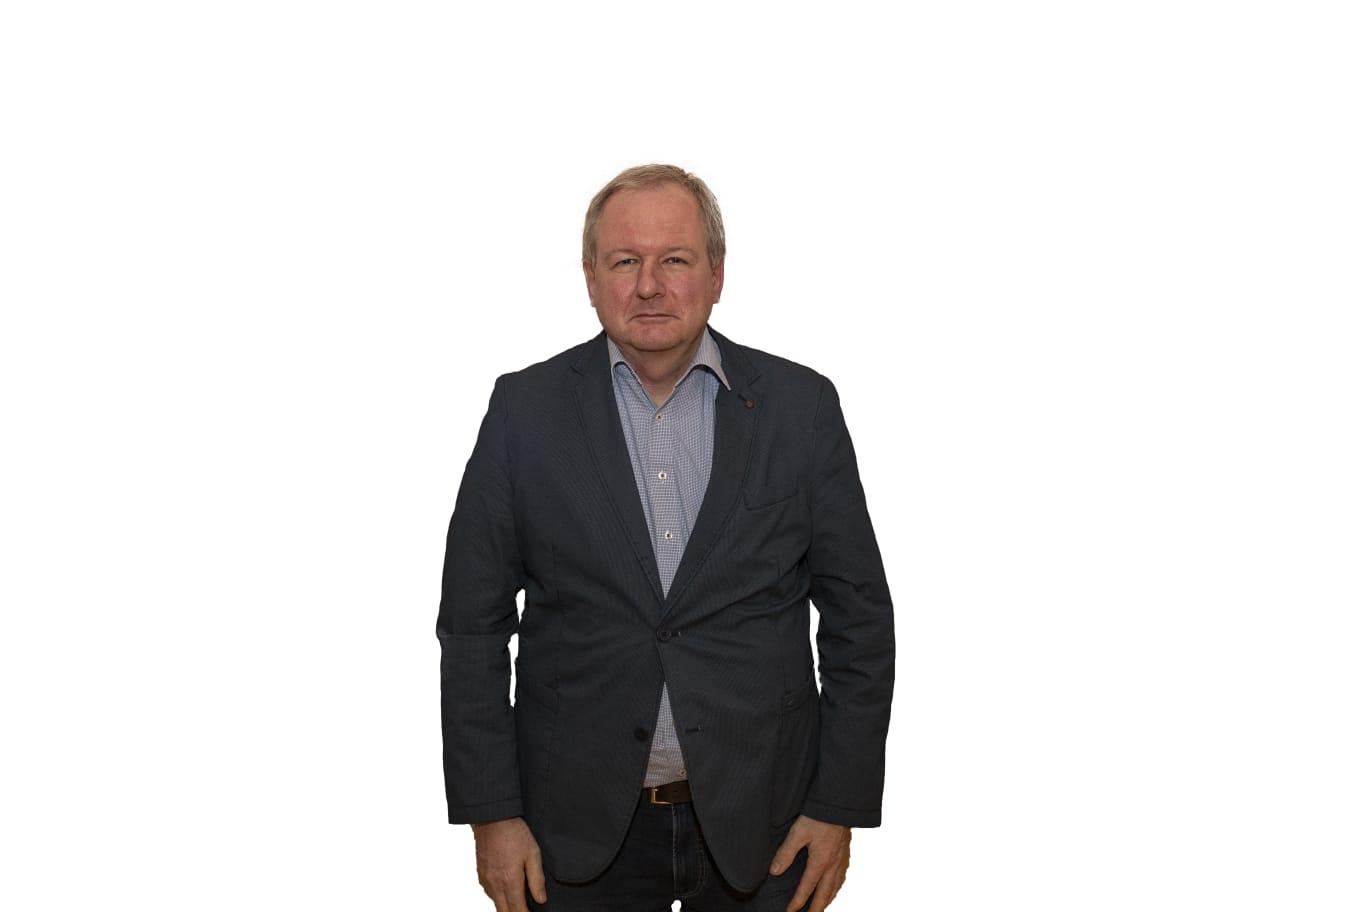 Frank Scholz